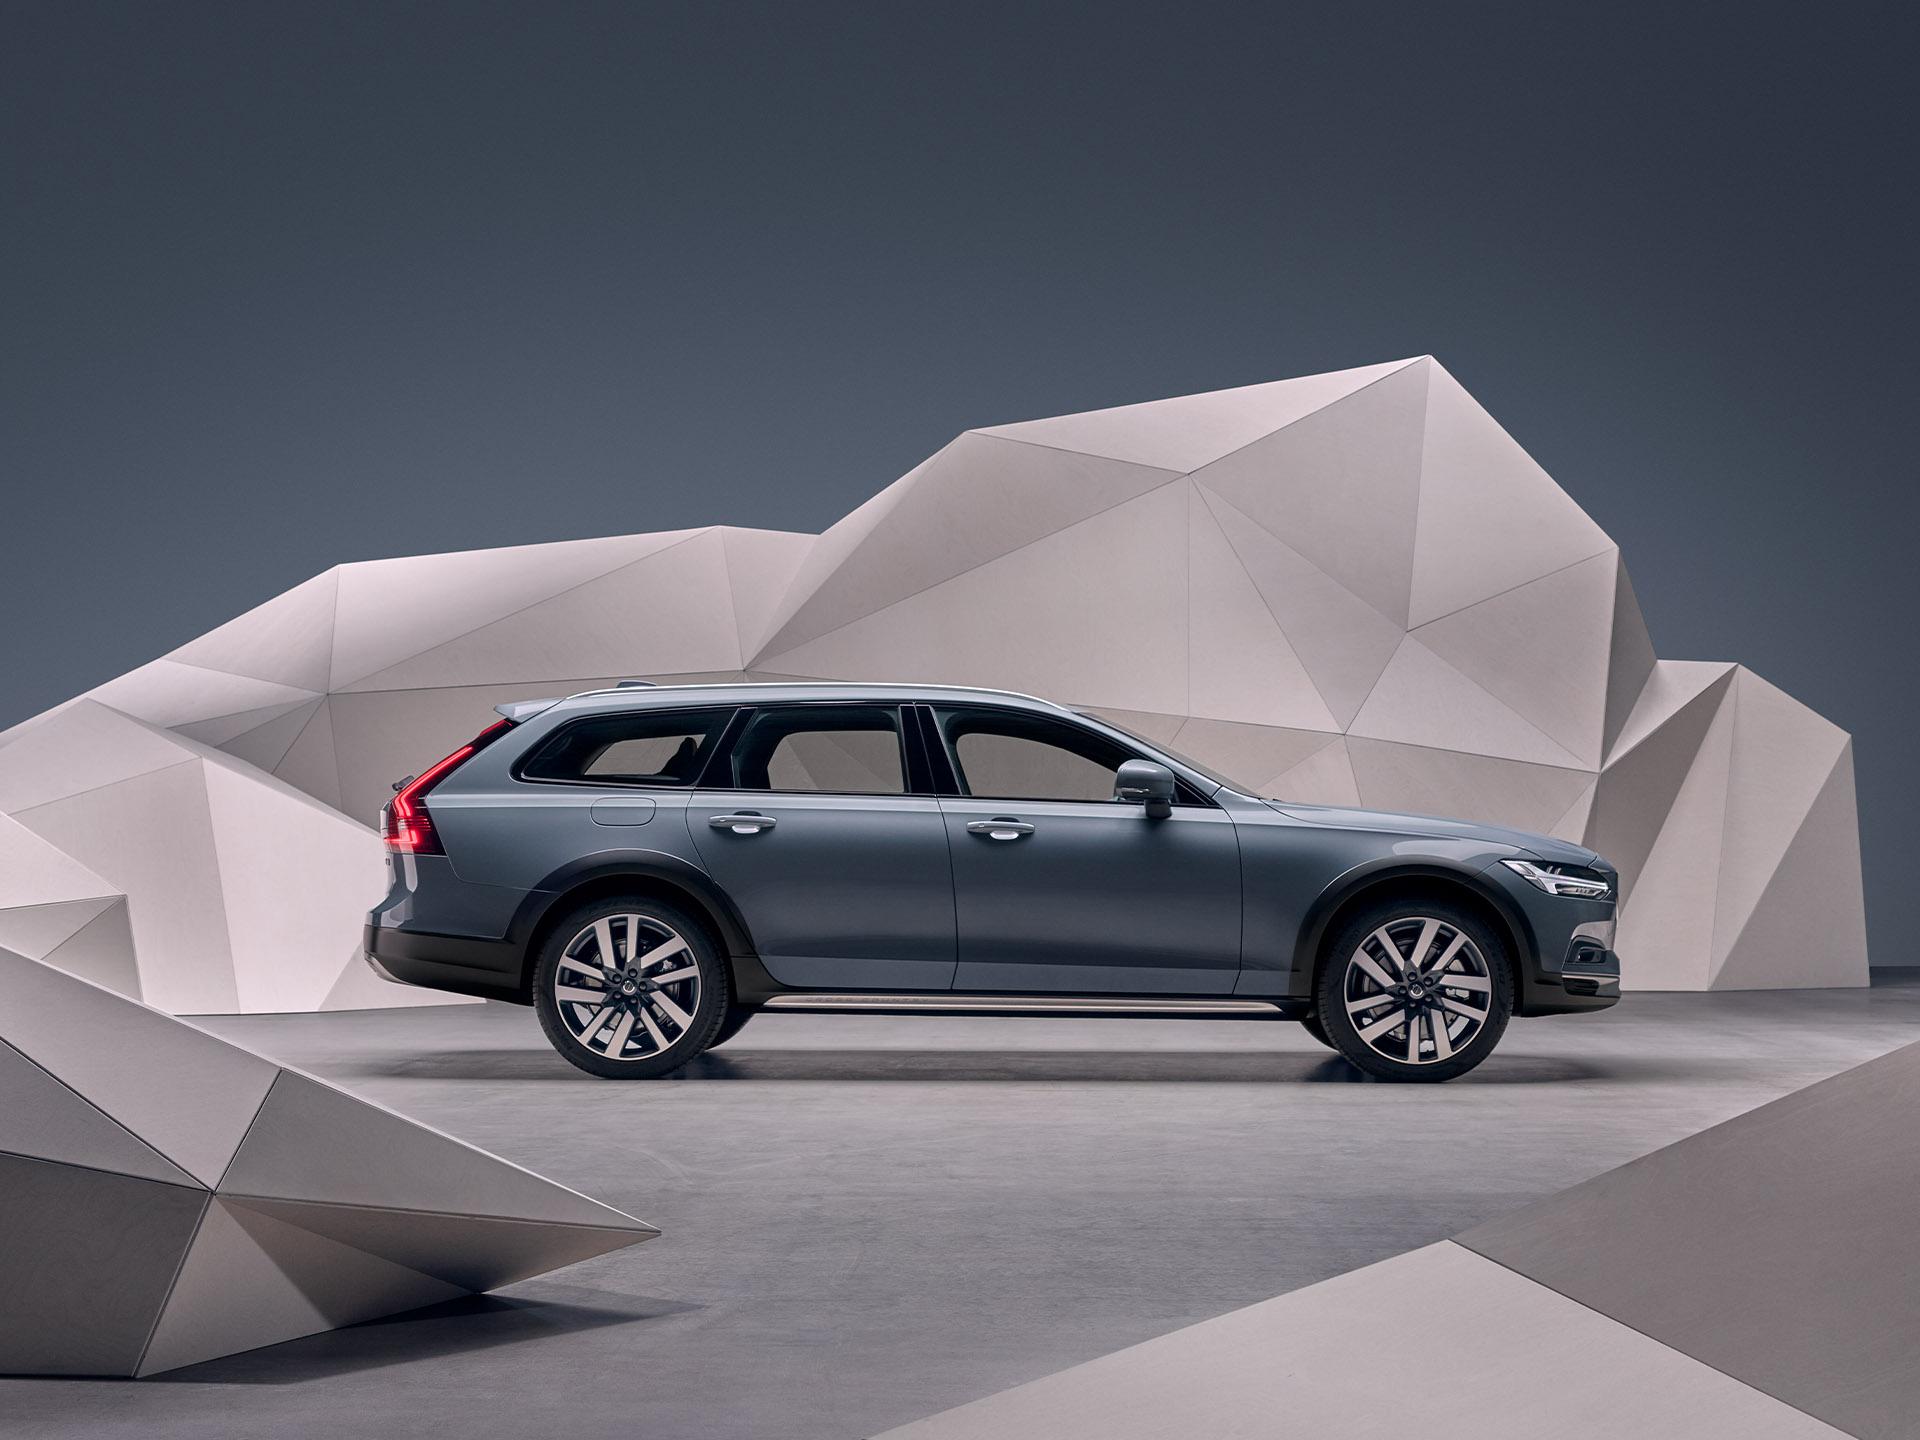 Karavan Volvo V90 sivoplave boje parkiran ispred zida s umjetninama